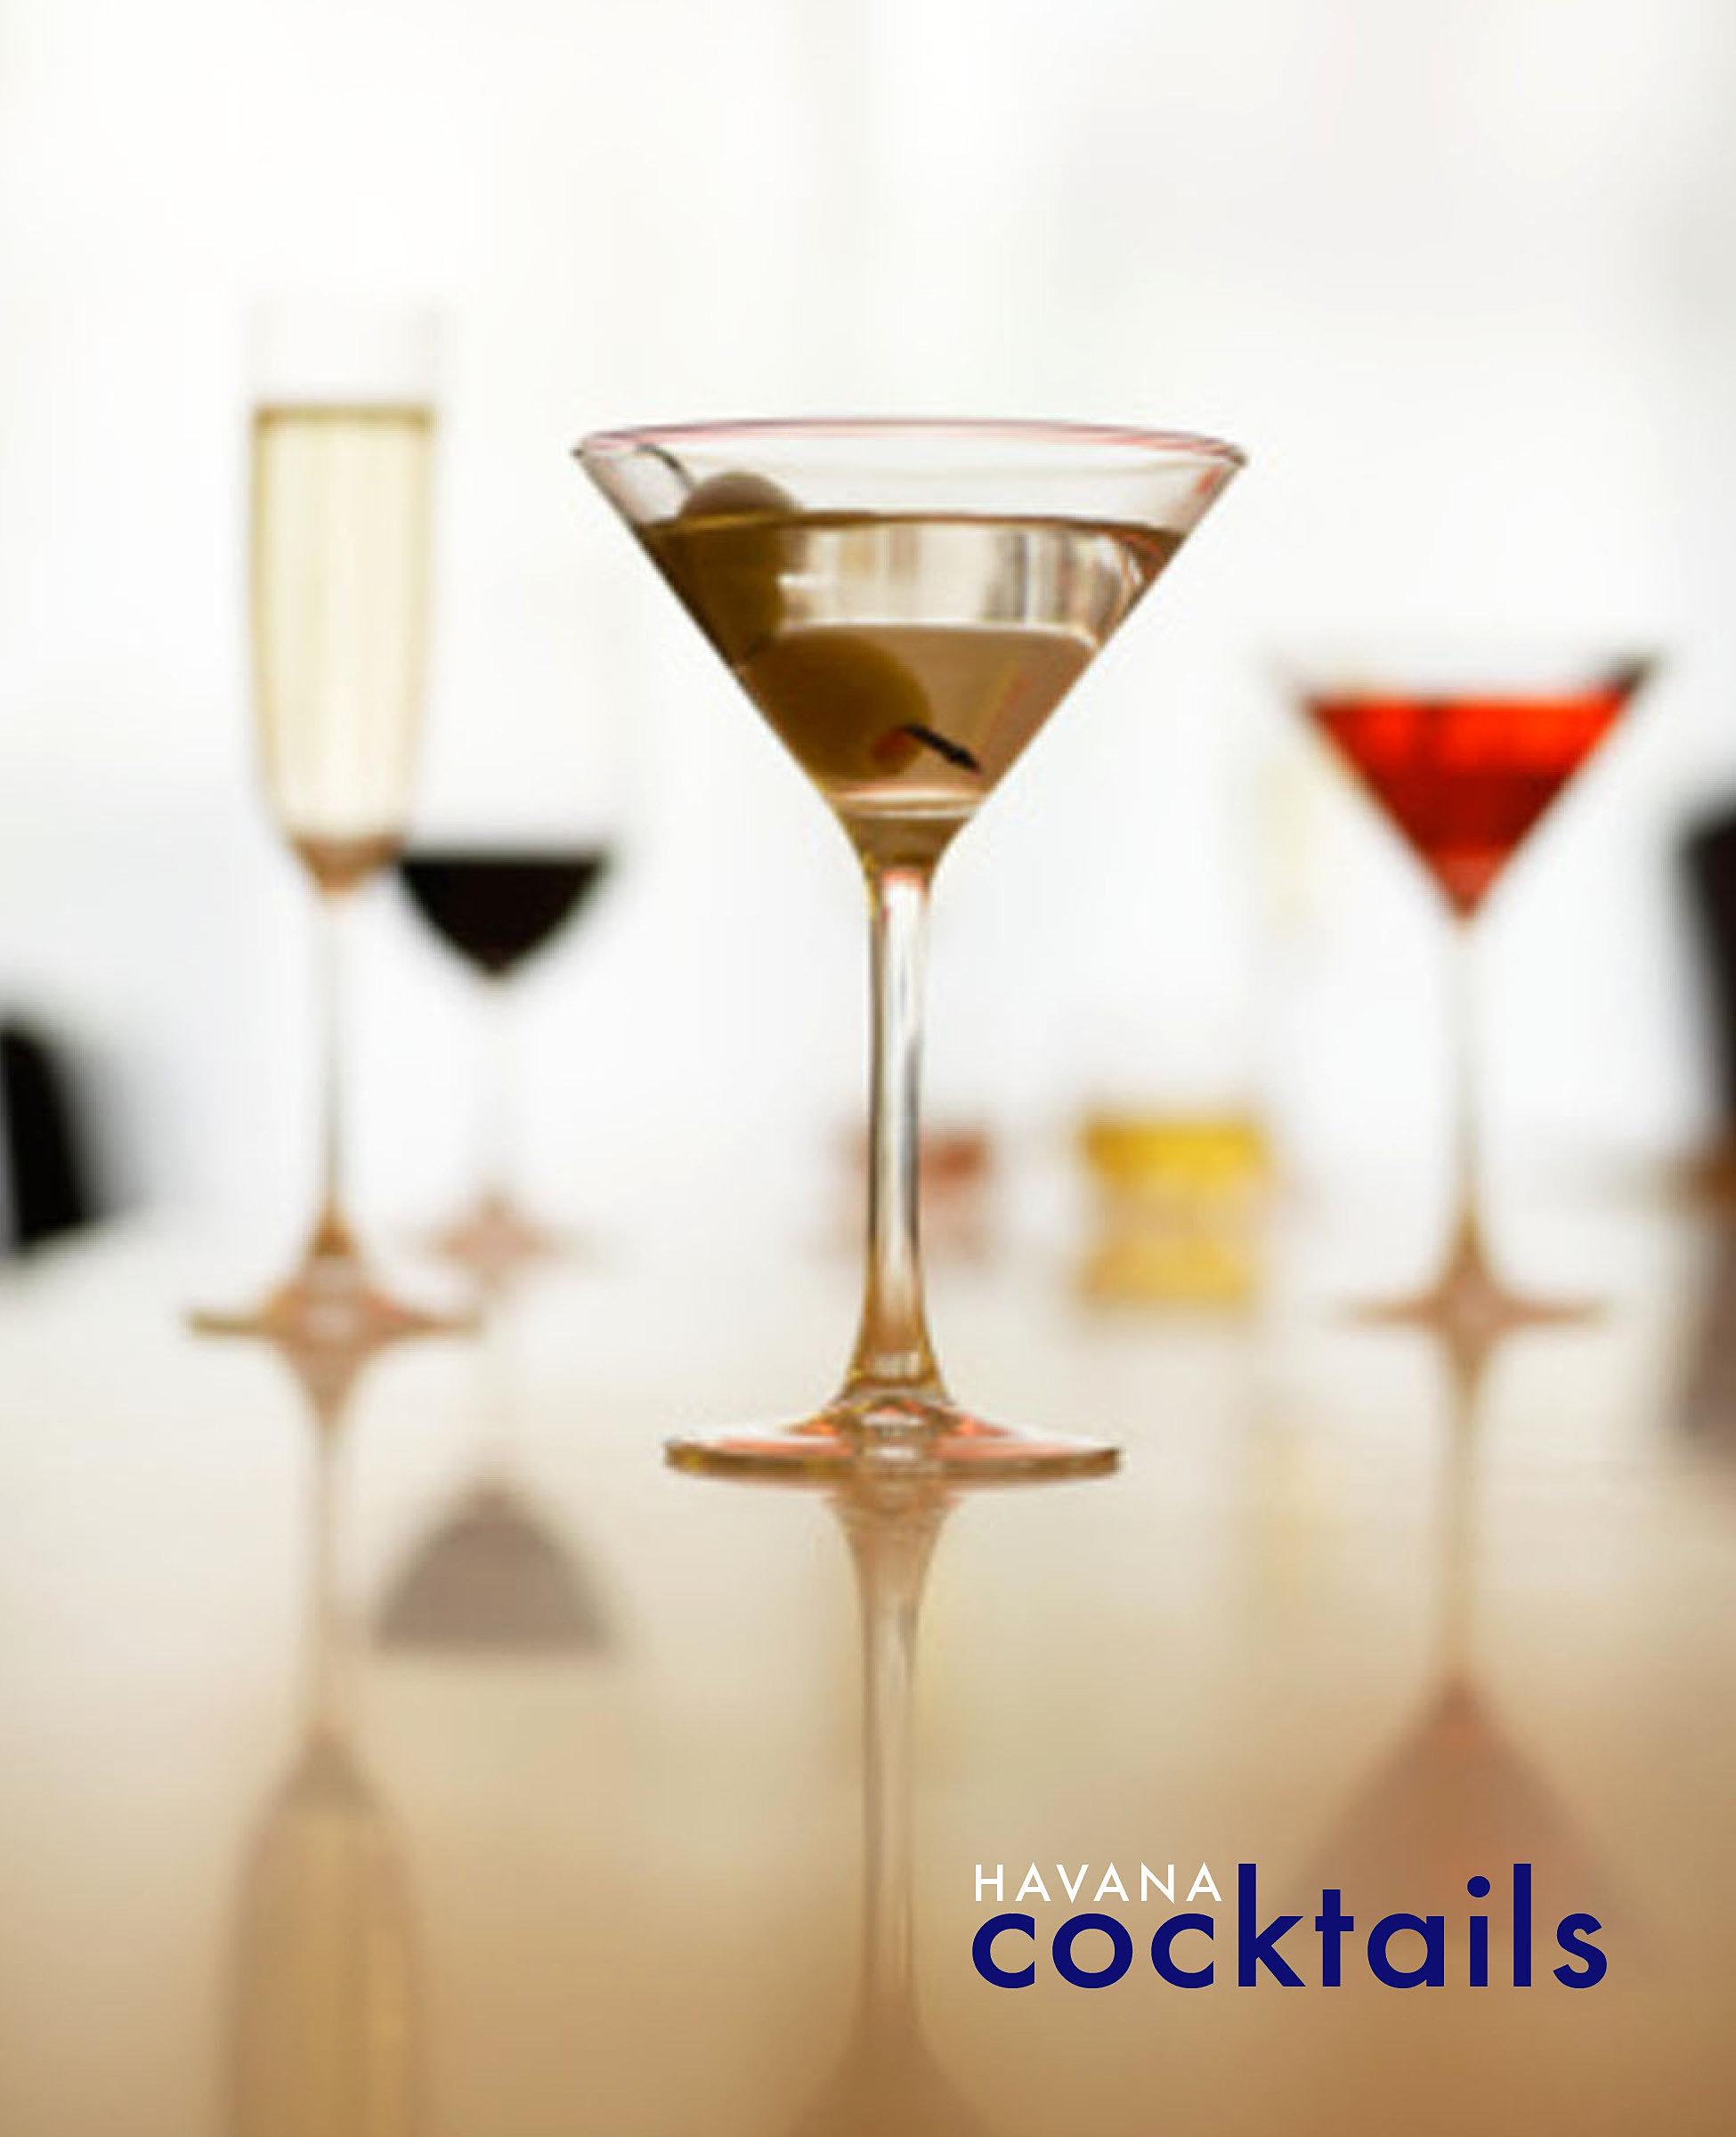 Havana Cocktail Book